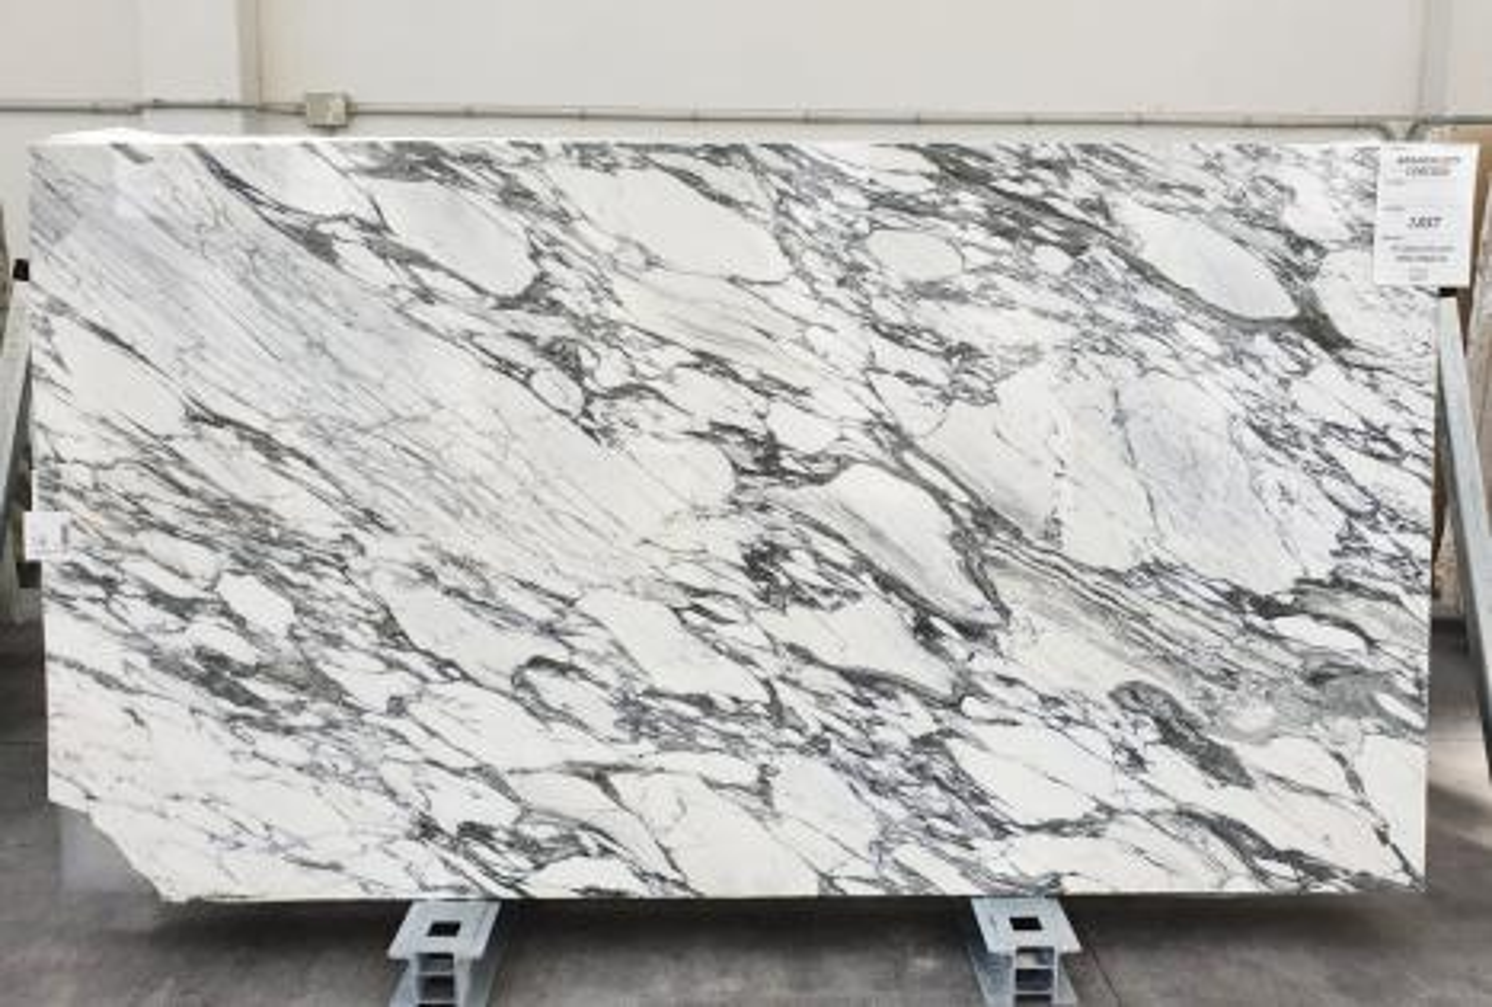 ARABESCATO CORCHIA Supply Veneto (Italy) polished slabs 1337 , SL2CM natural marble